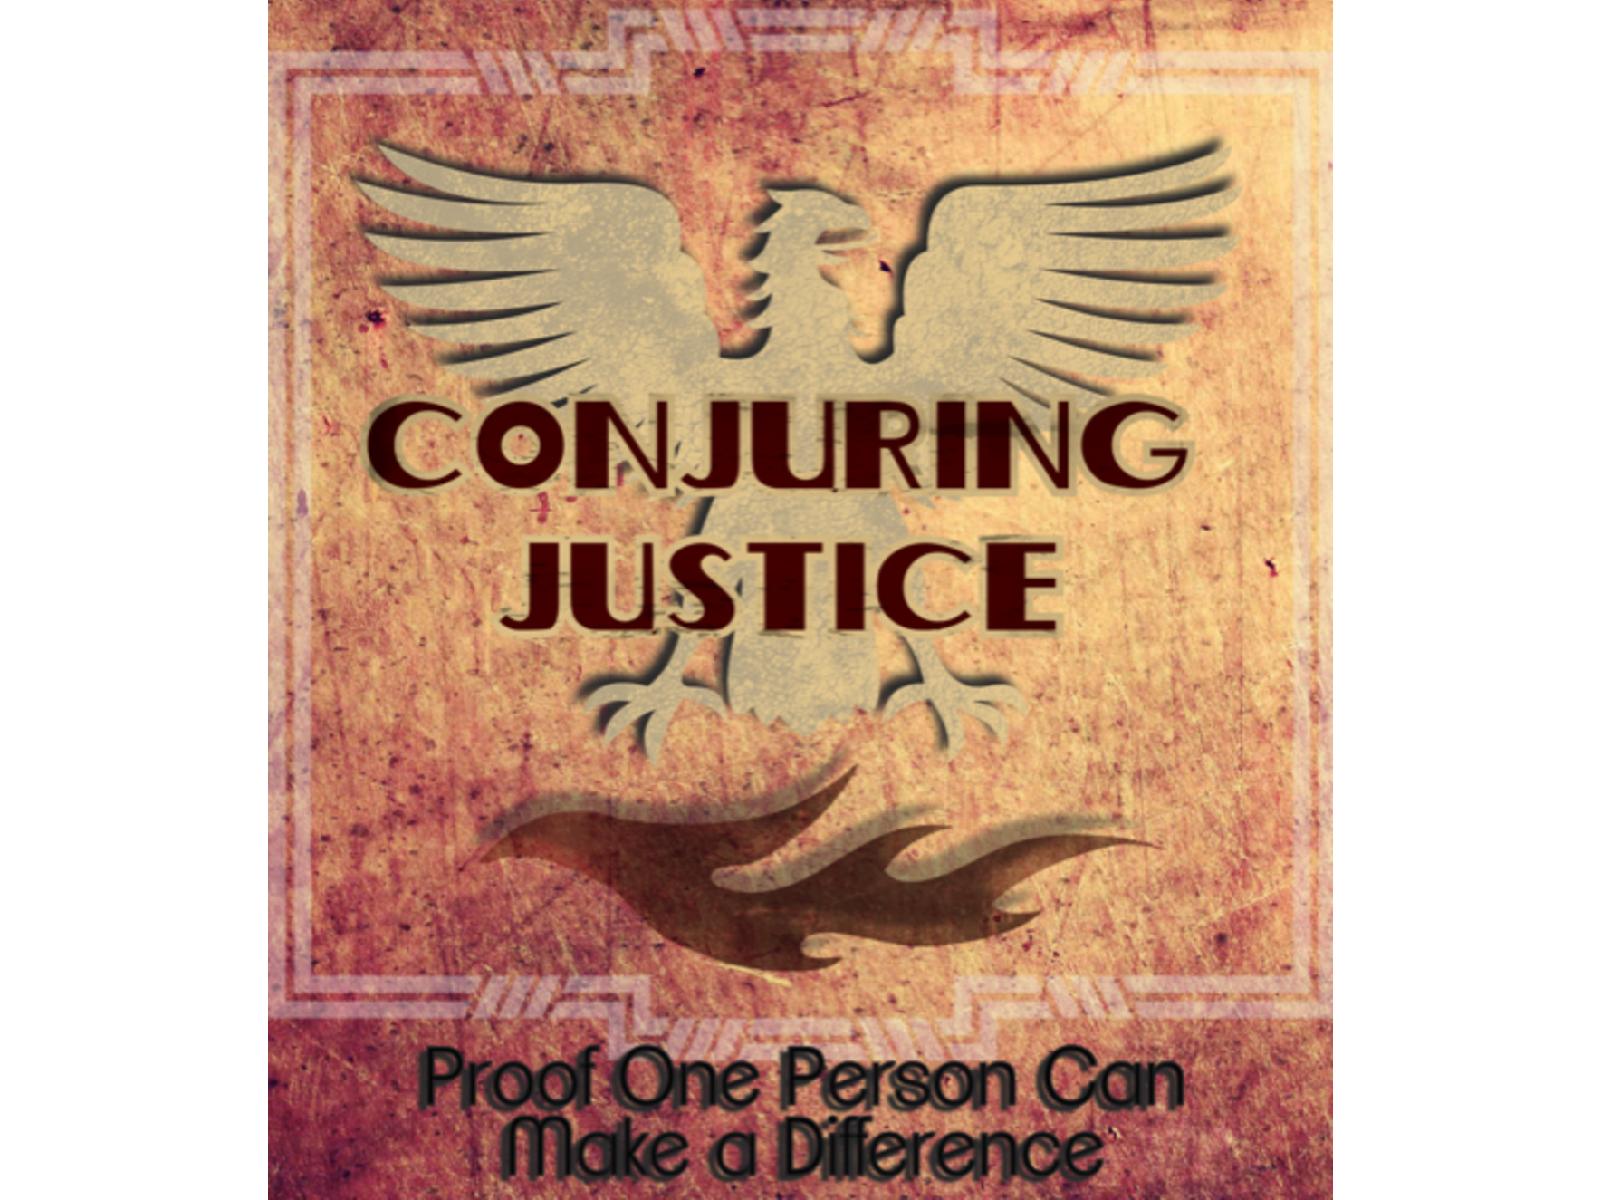 Conjuring Justice